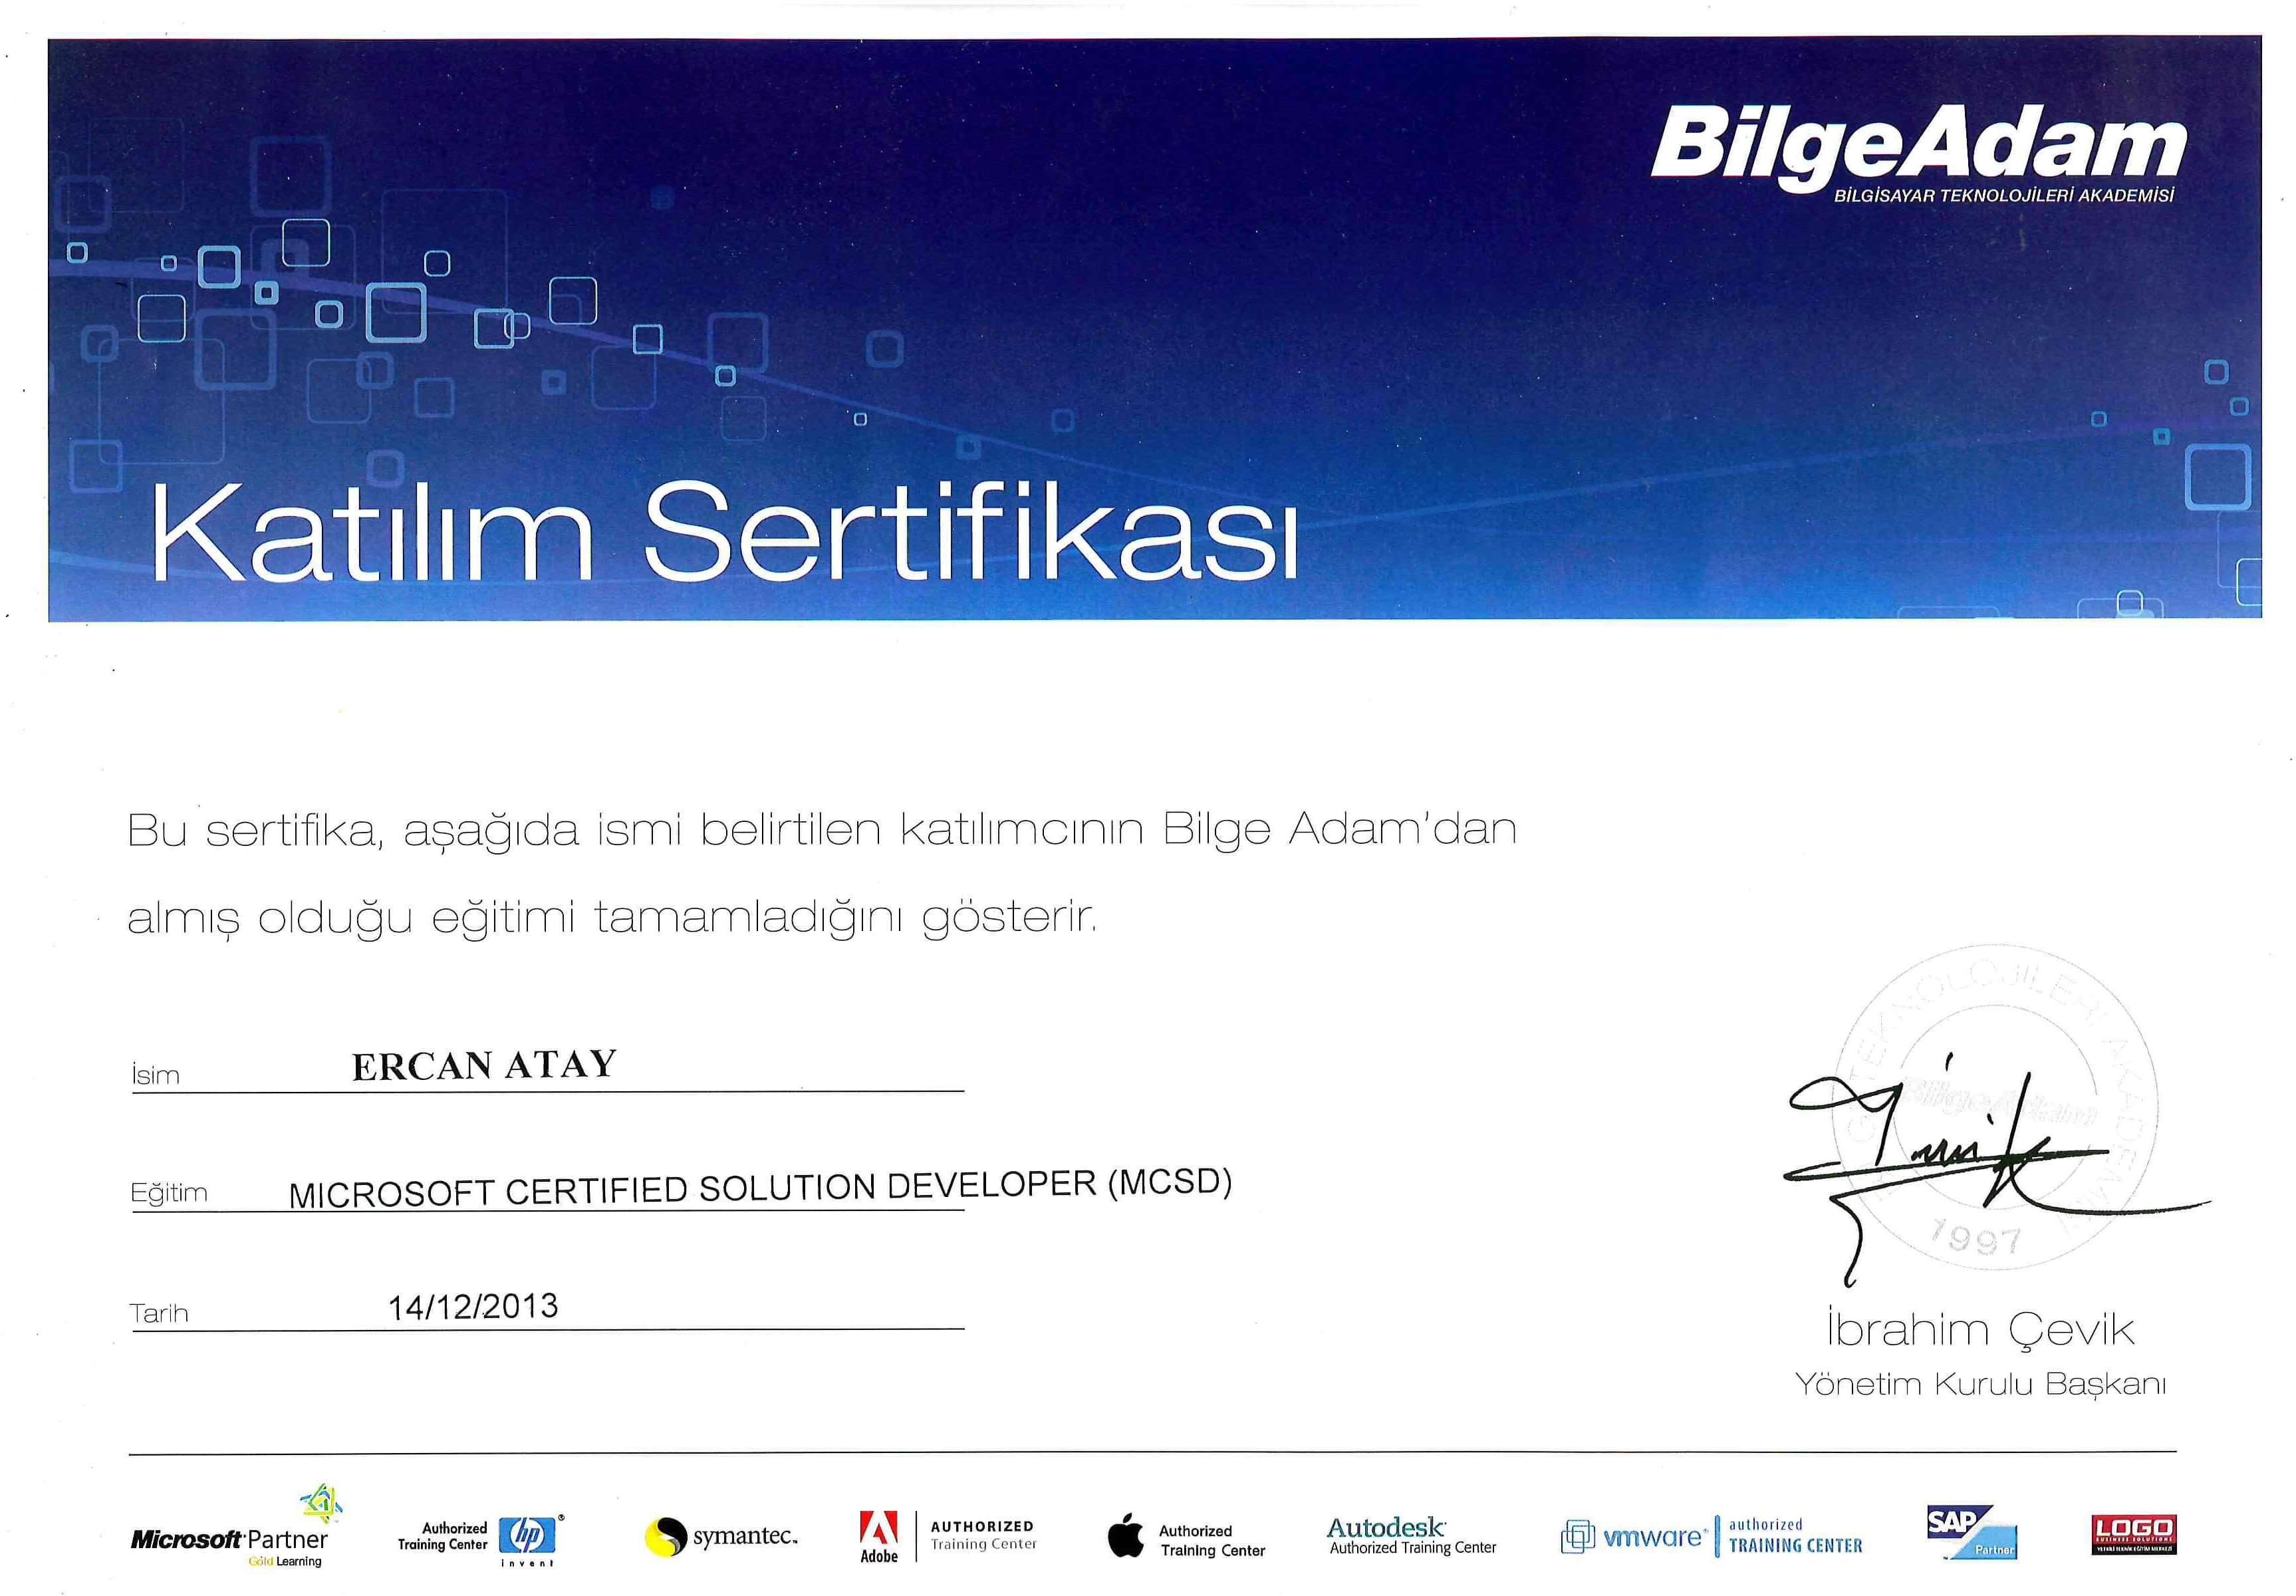 Microsoft Certified Solutions Developer Mcsd Bilge Adam Katlm